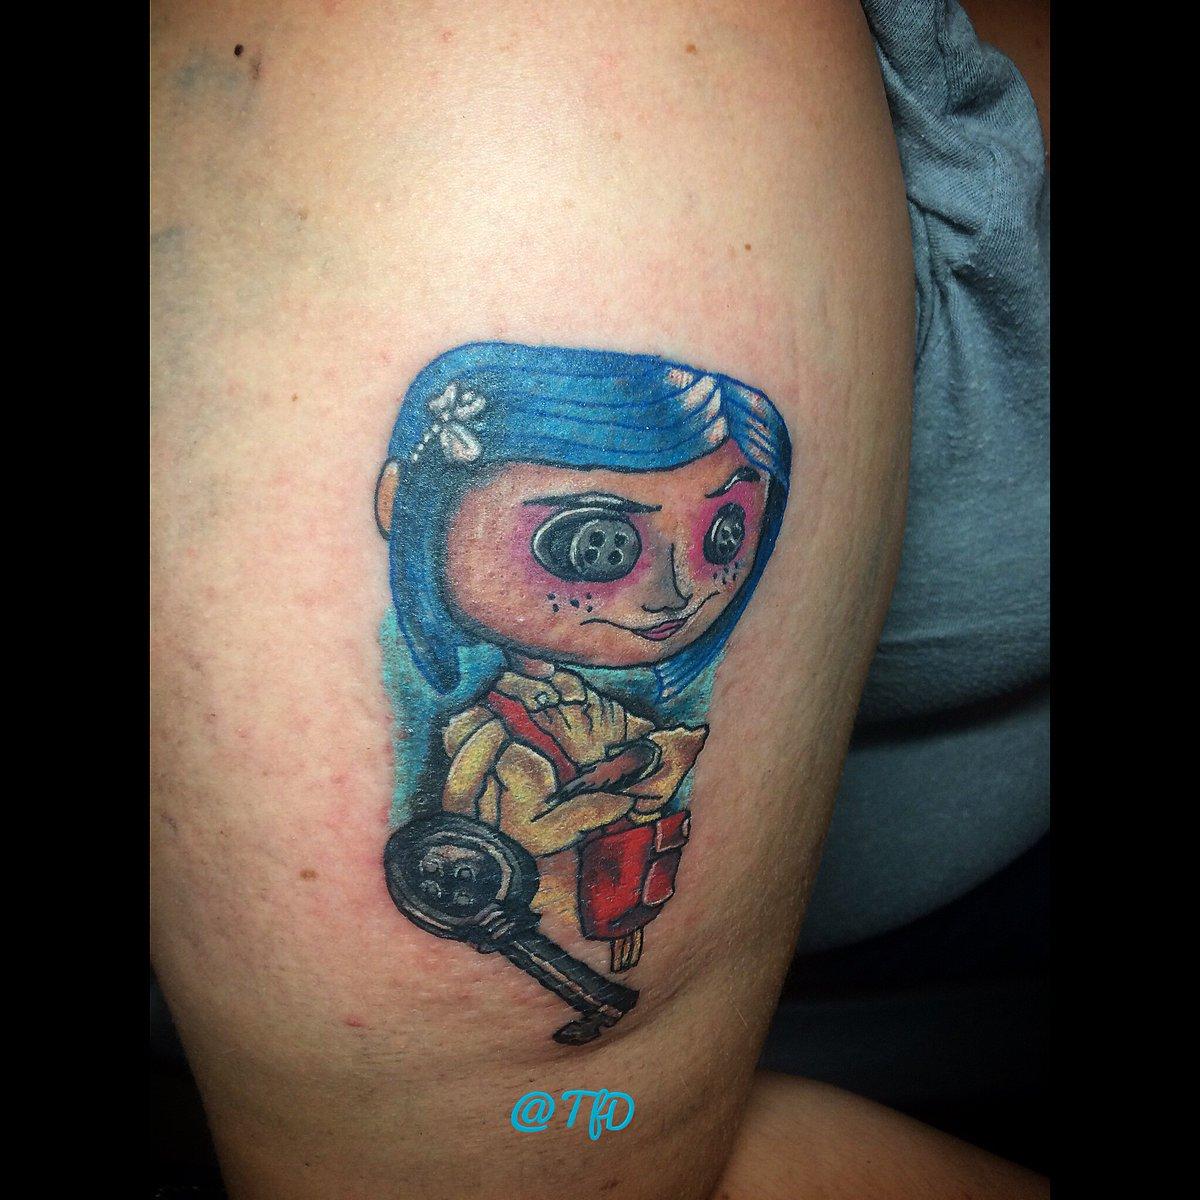 Danny Moore On Twitter Timburtonartnew Timburton Coraline Tattoos I Made Thanks For Looking Super Fun Ig Tattoosfromdanny